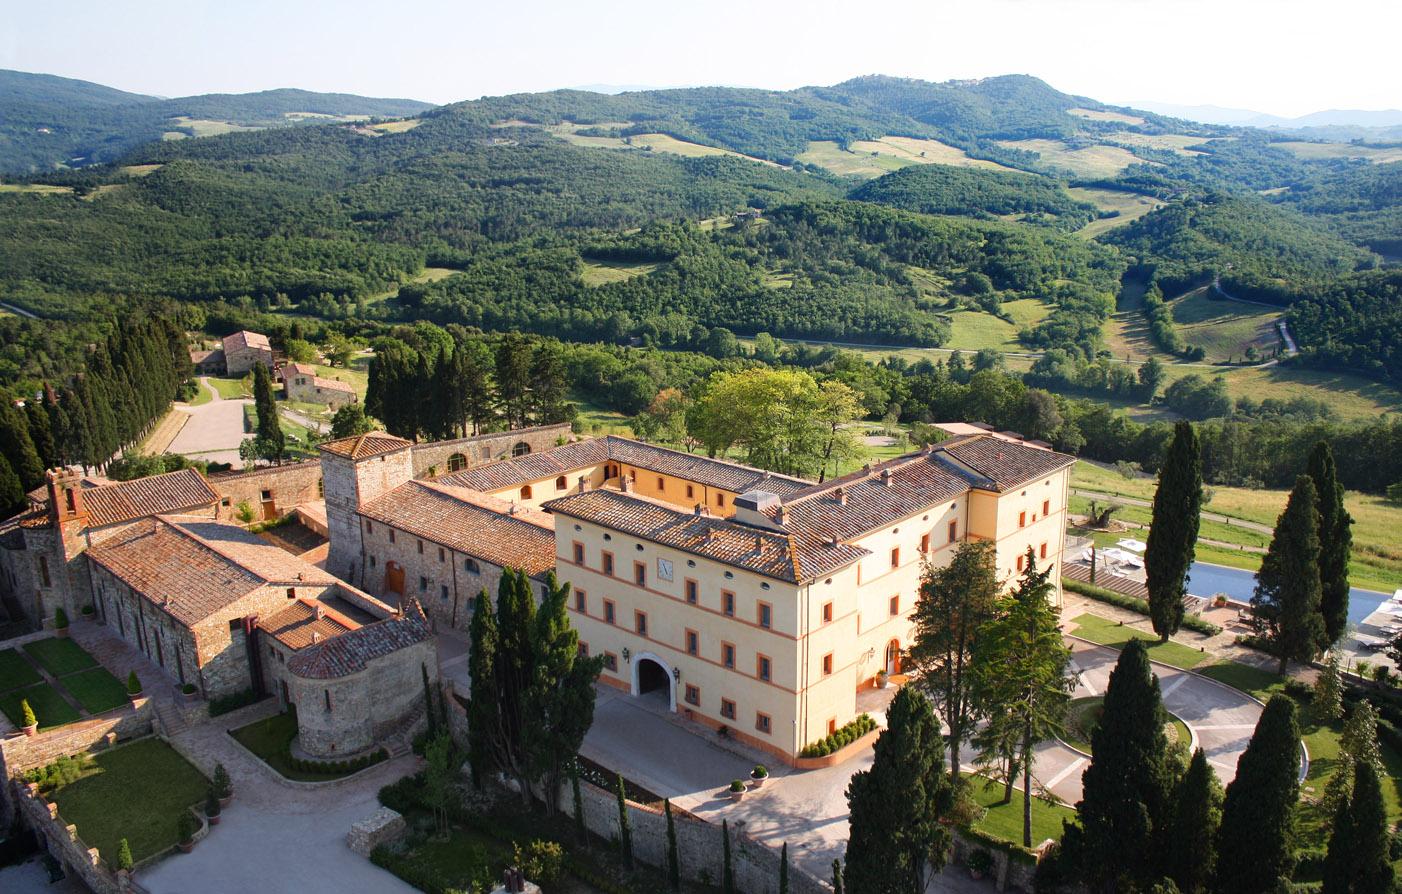 Luxury Tuscany Hotel  Castello di Casole  Luxury Italy ...